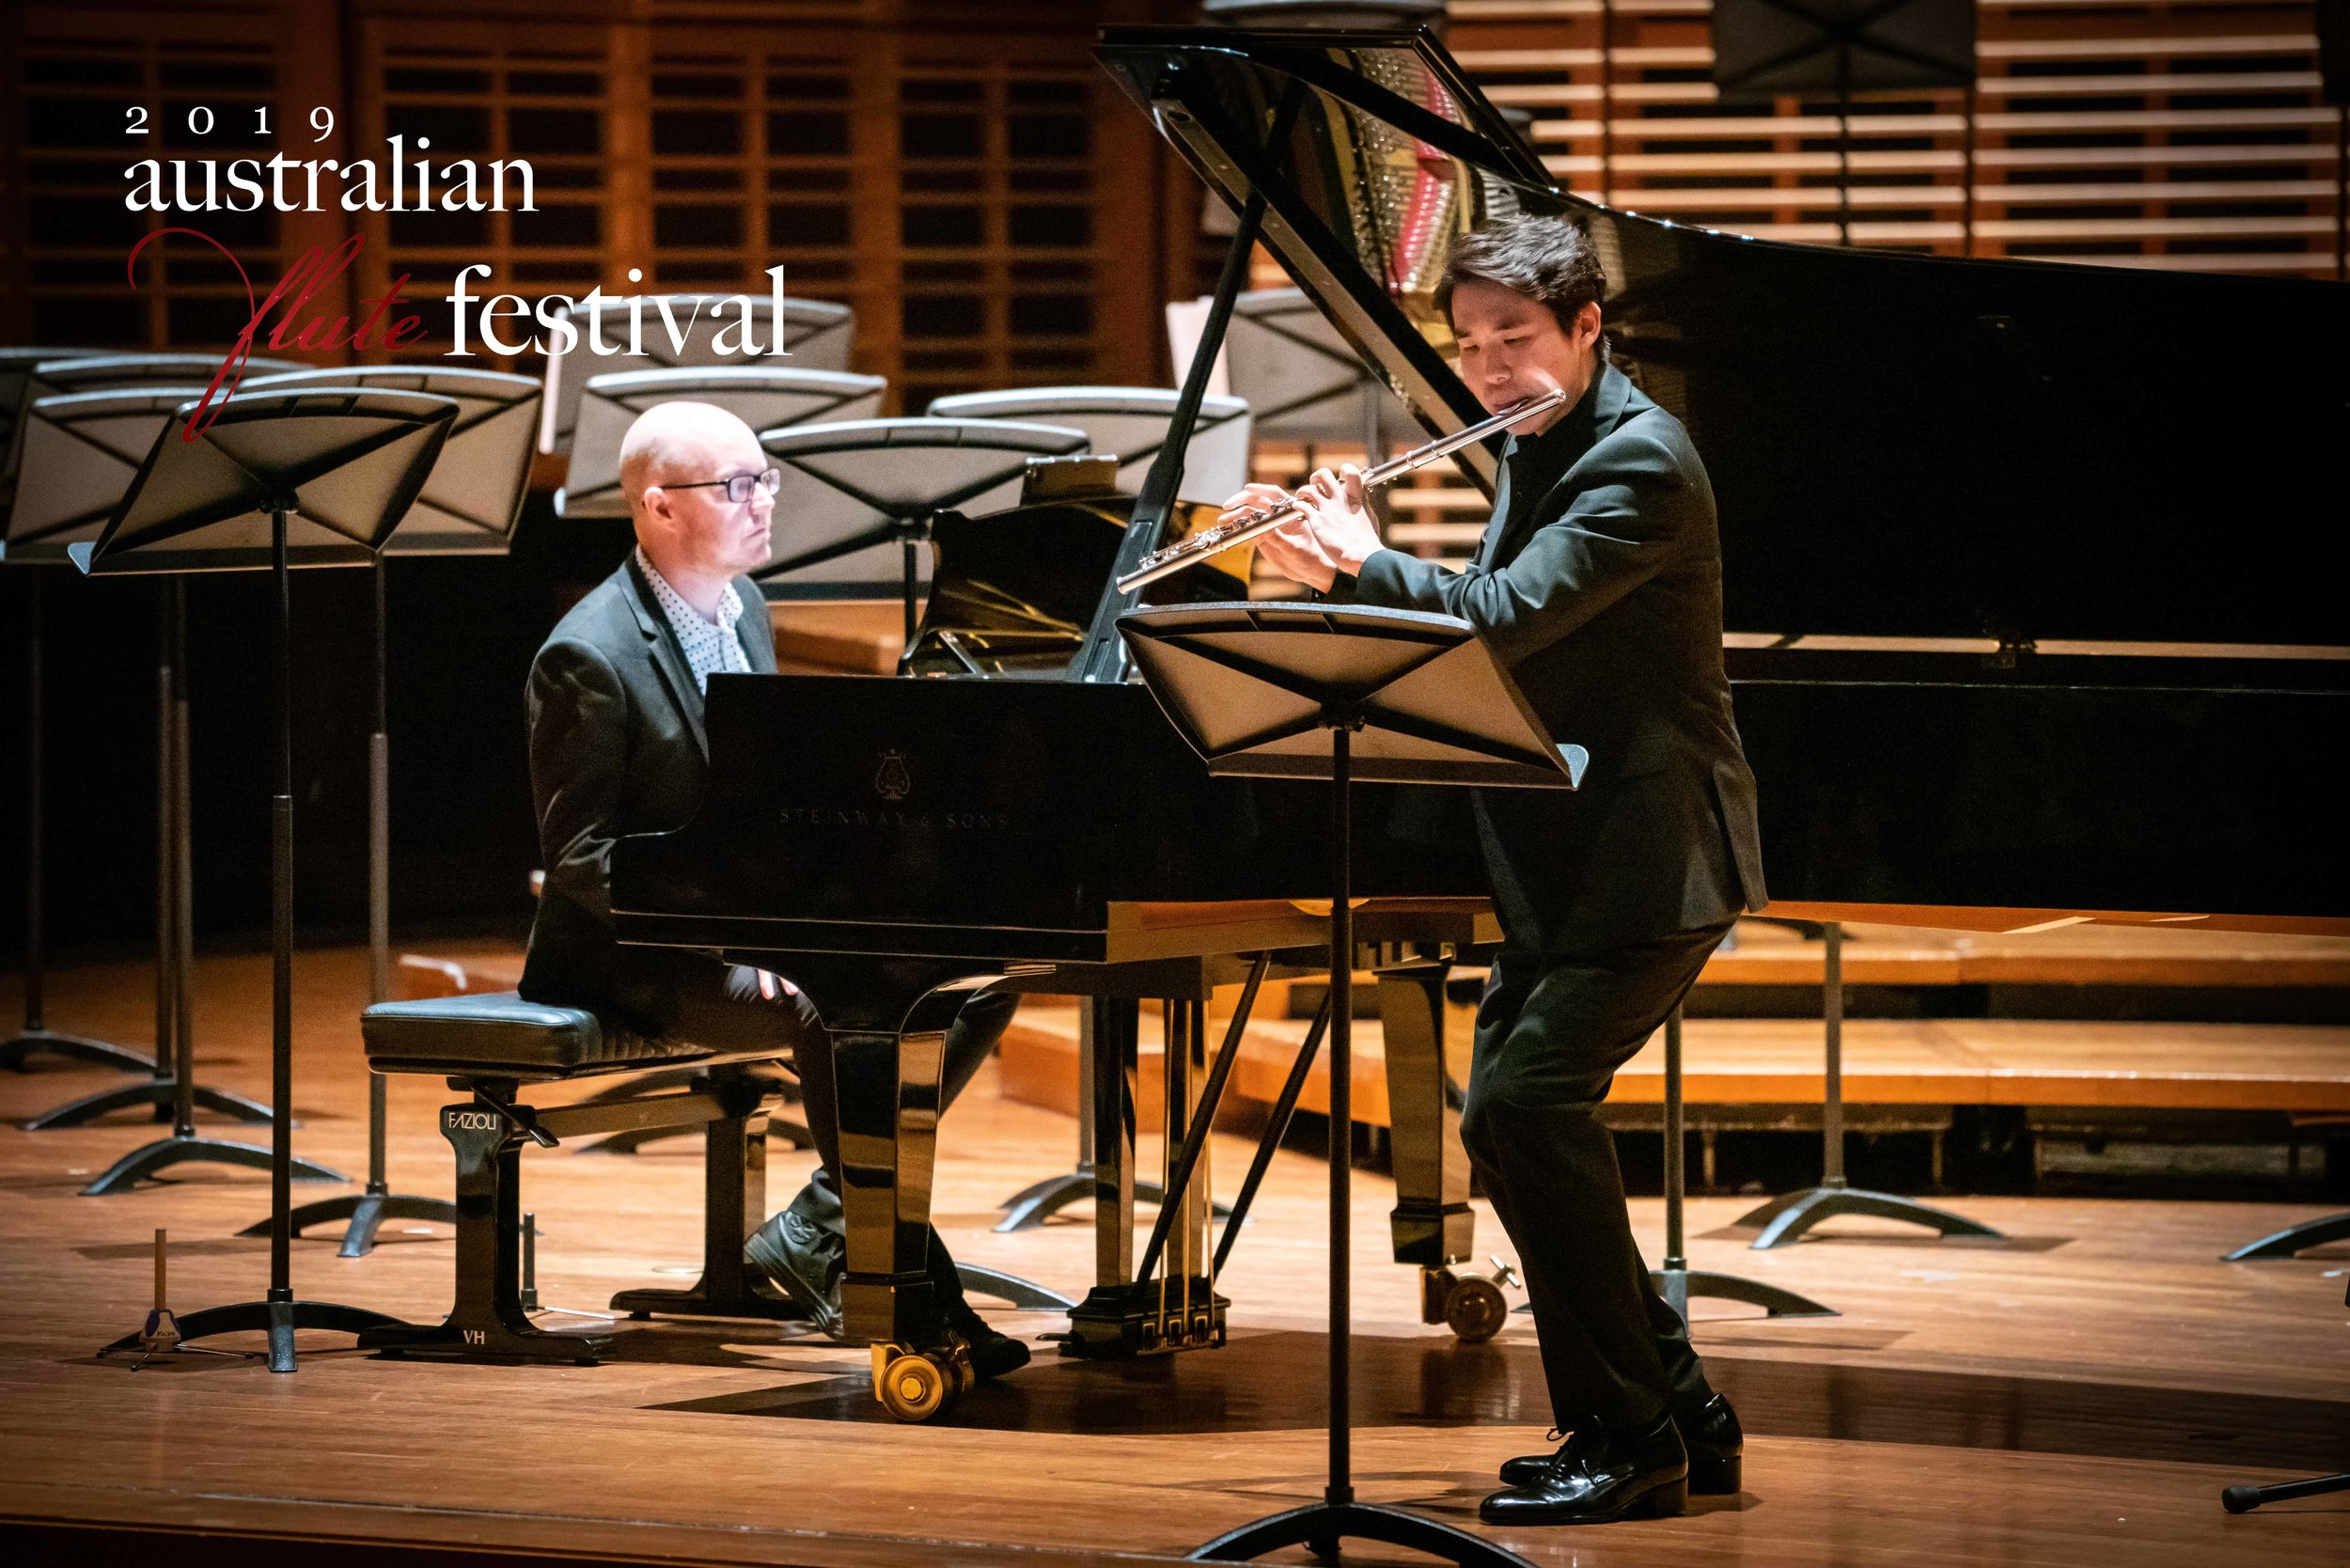 Brian Kim performing at the Australian Flute Festival 2019 Closing Concert.